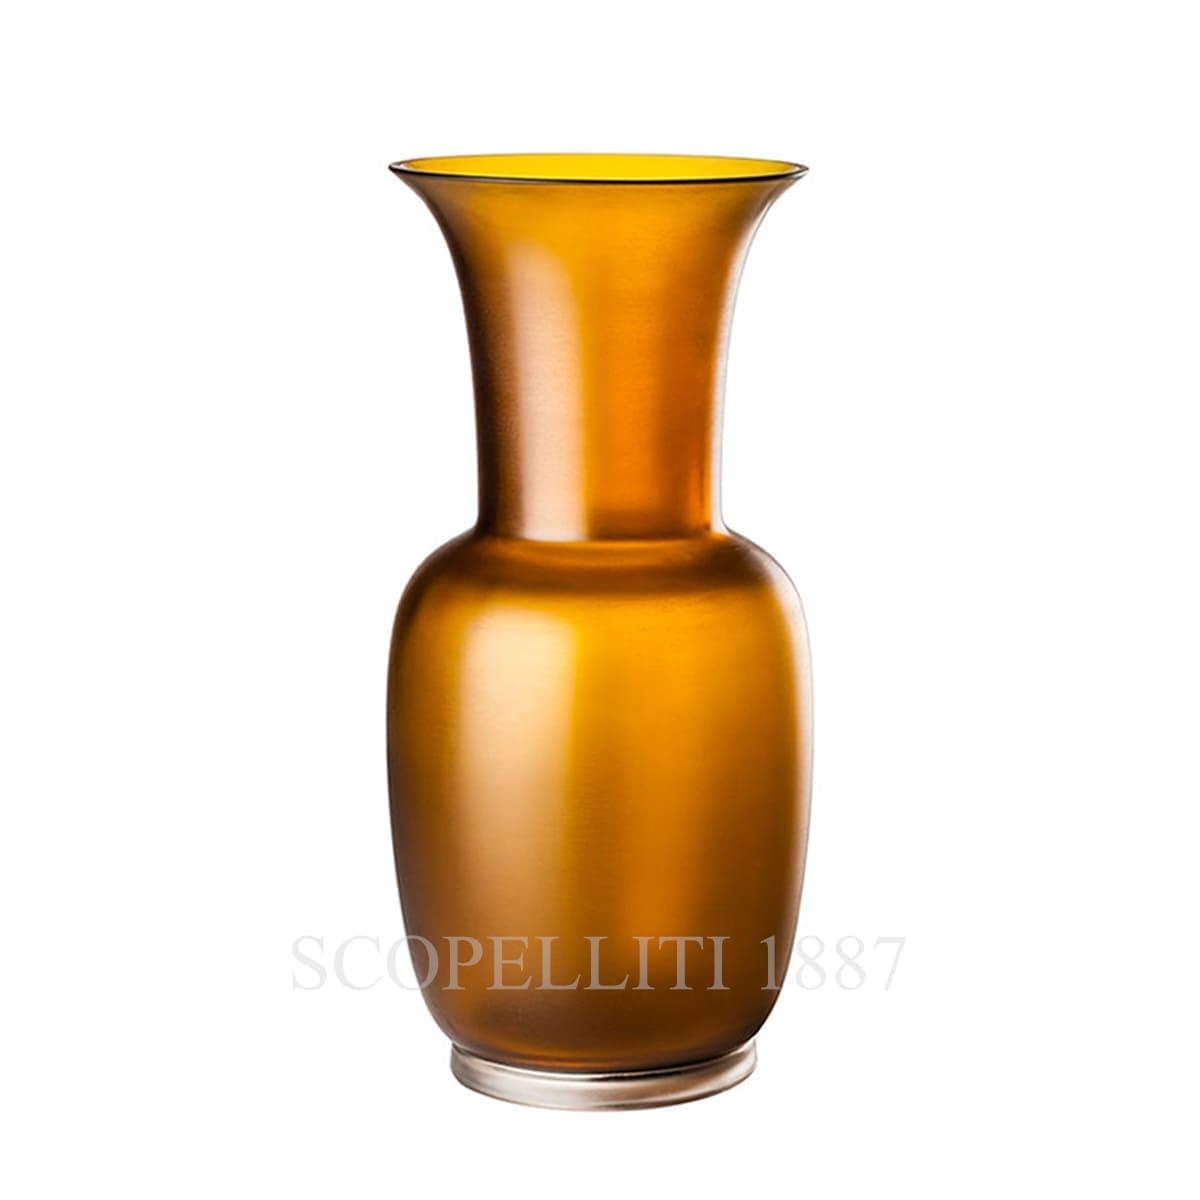 murano glass venini italian designer vase